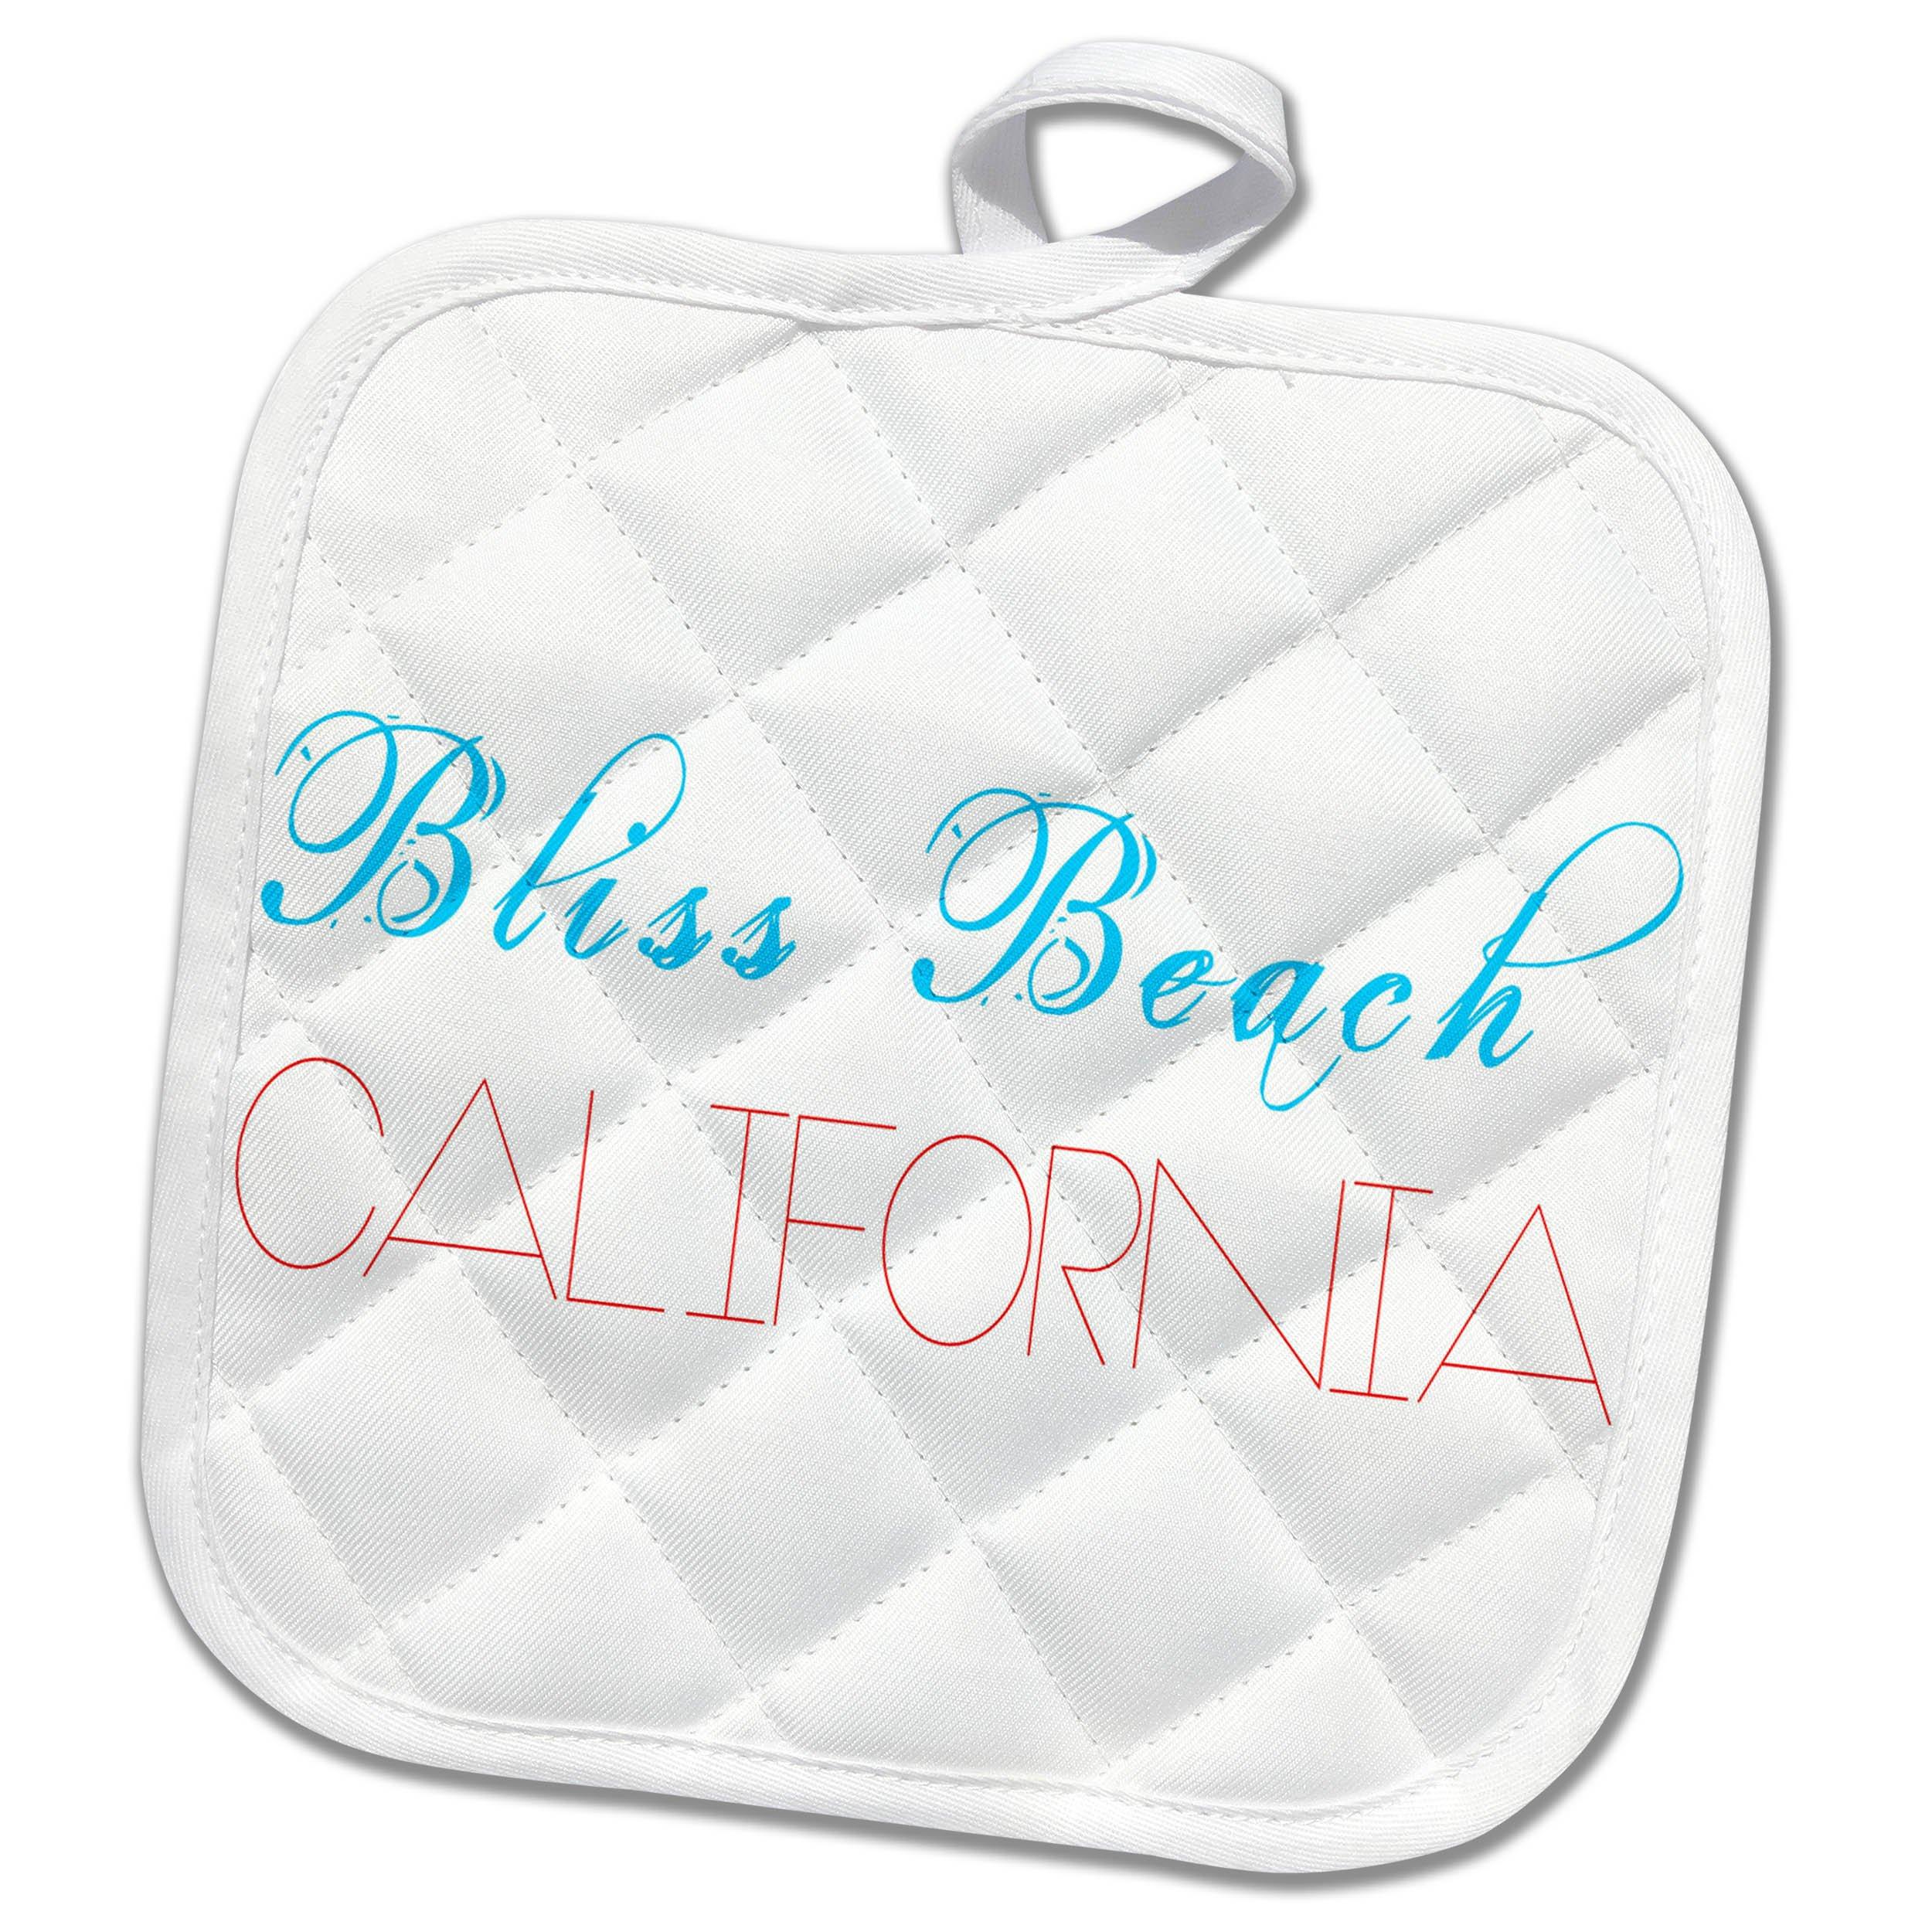 3dRose Alexis Design - American Beaches - American Beaches - Bliss Beach, California, blue, red on white - 8x8 Potholder (phl_273956_1)